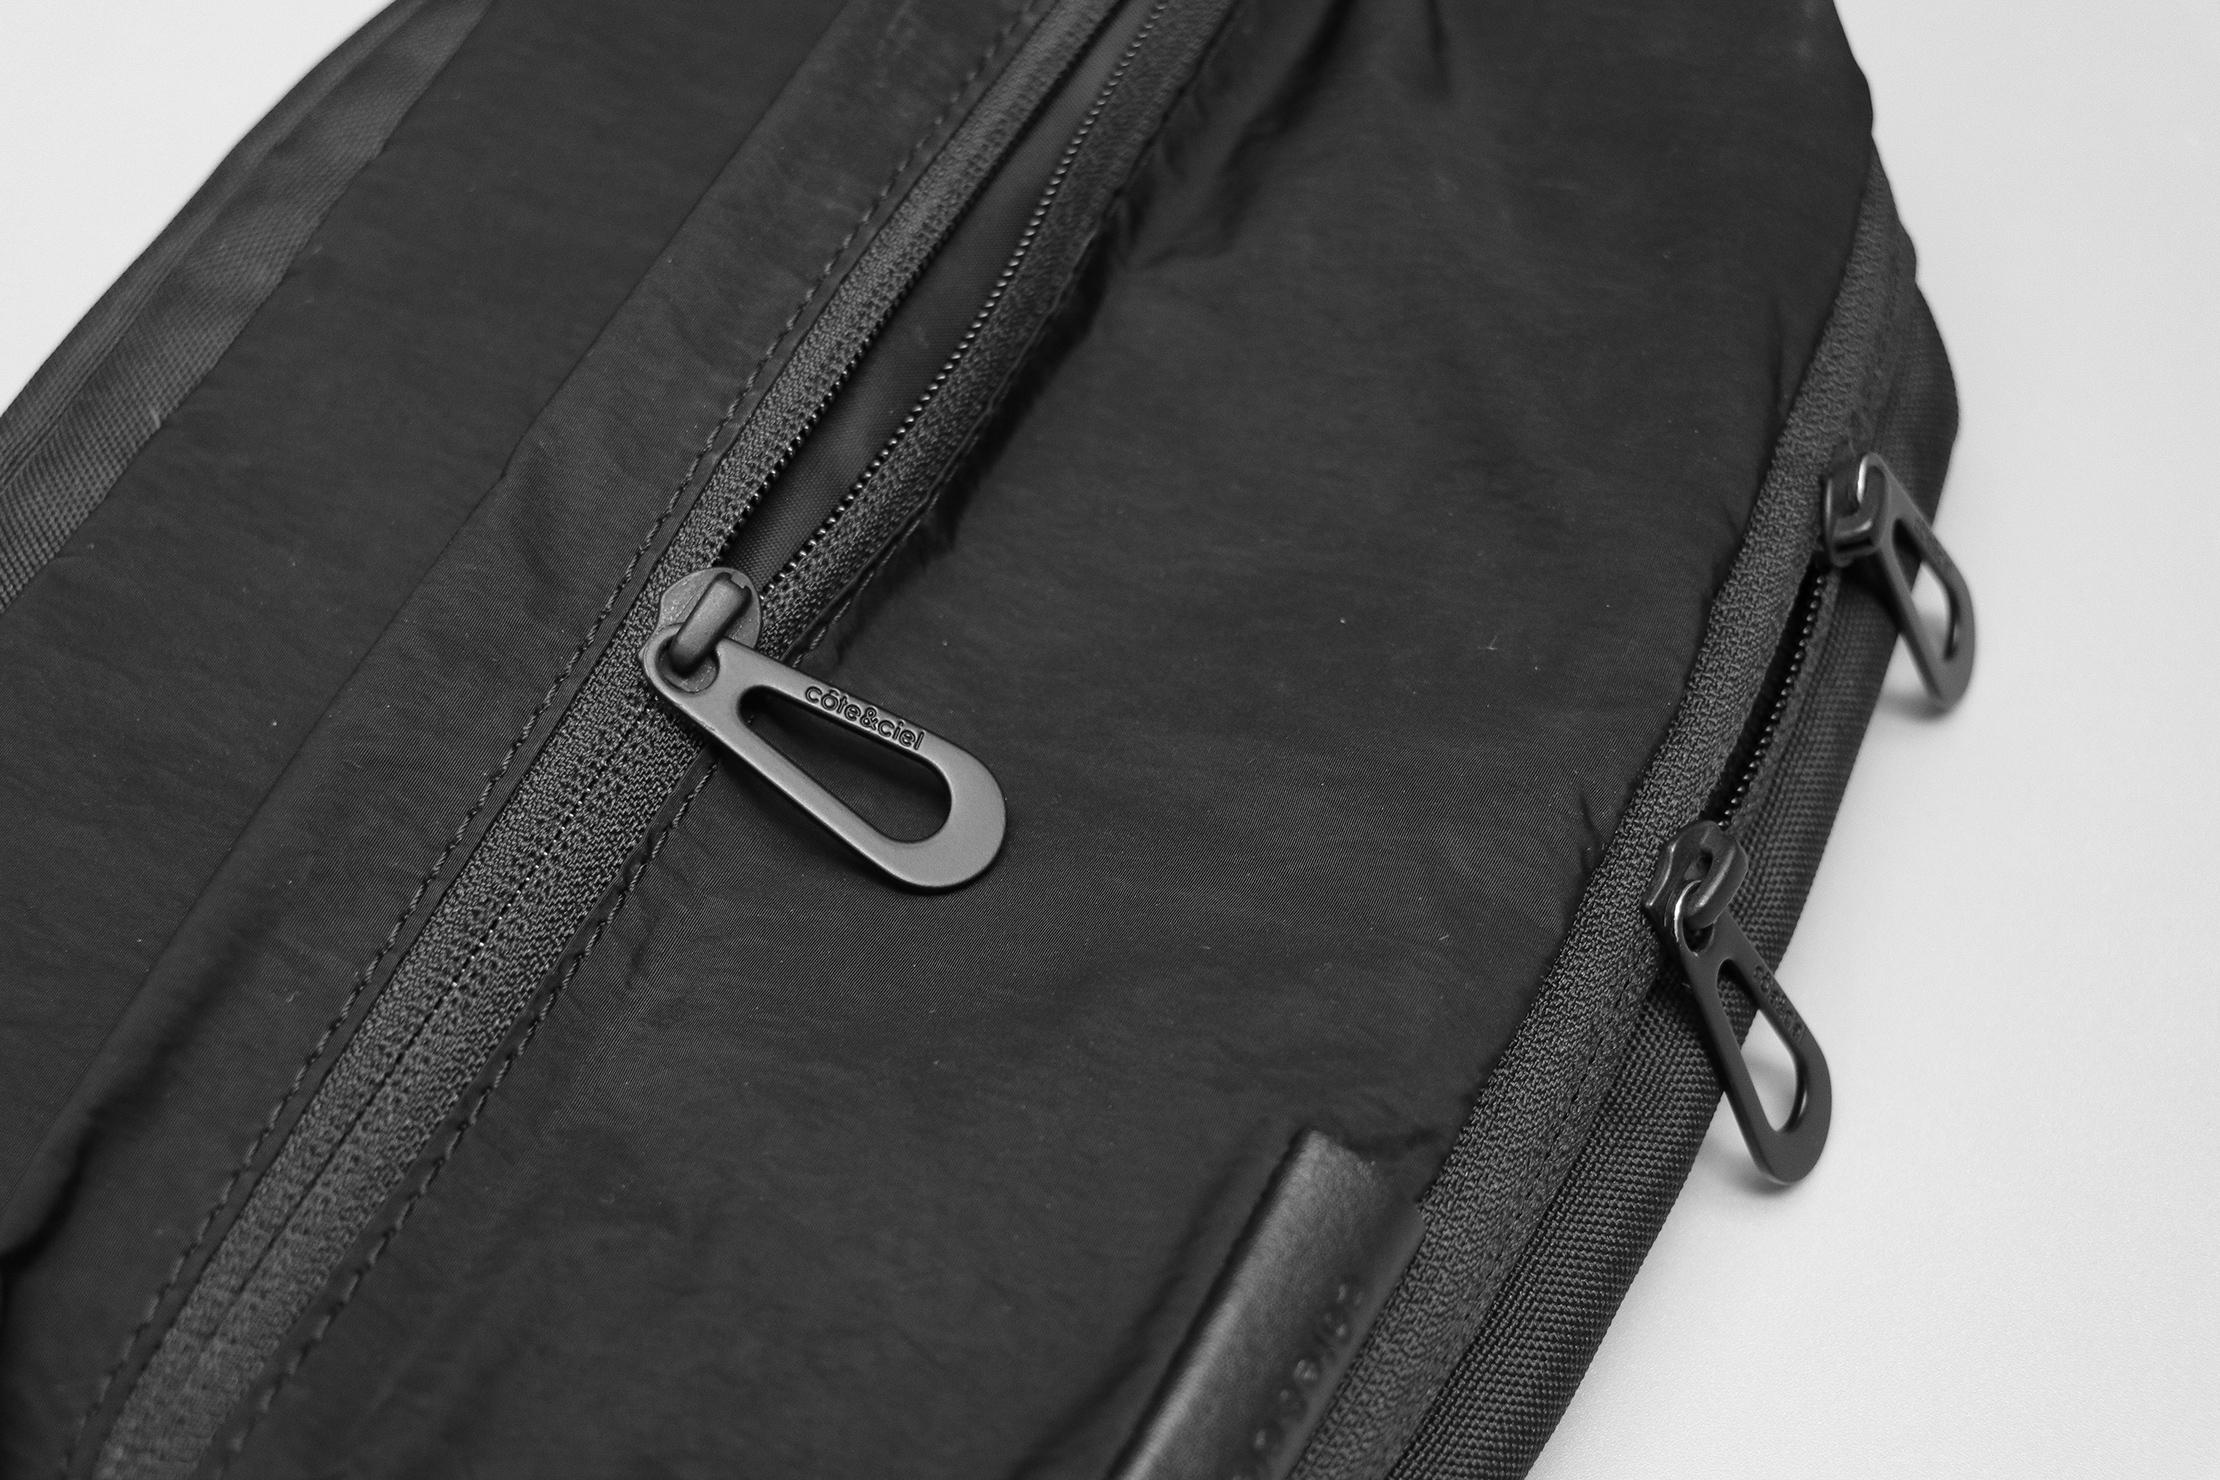 Côte&Ciel Isarau Small Zippers